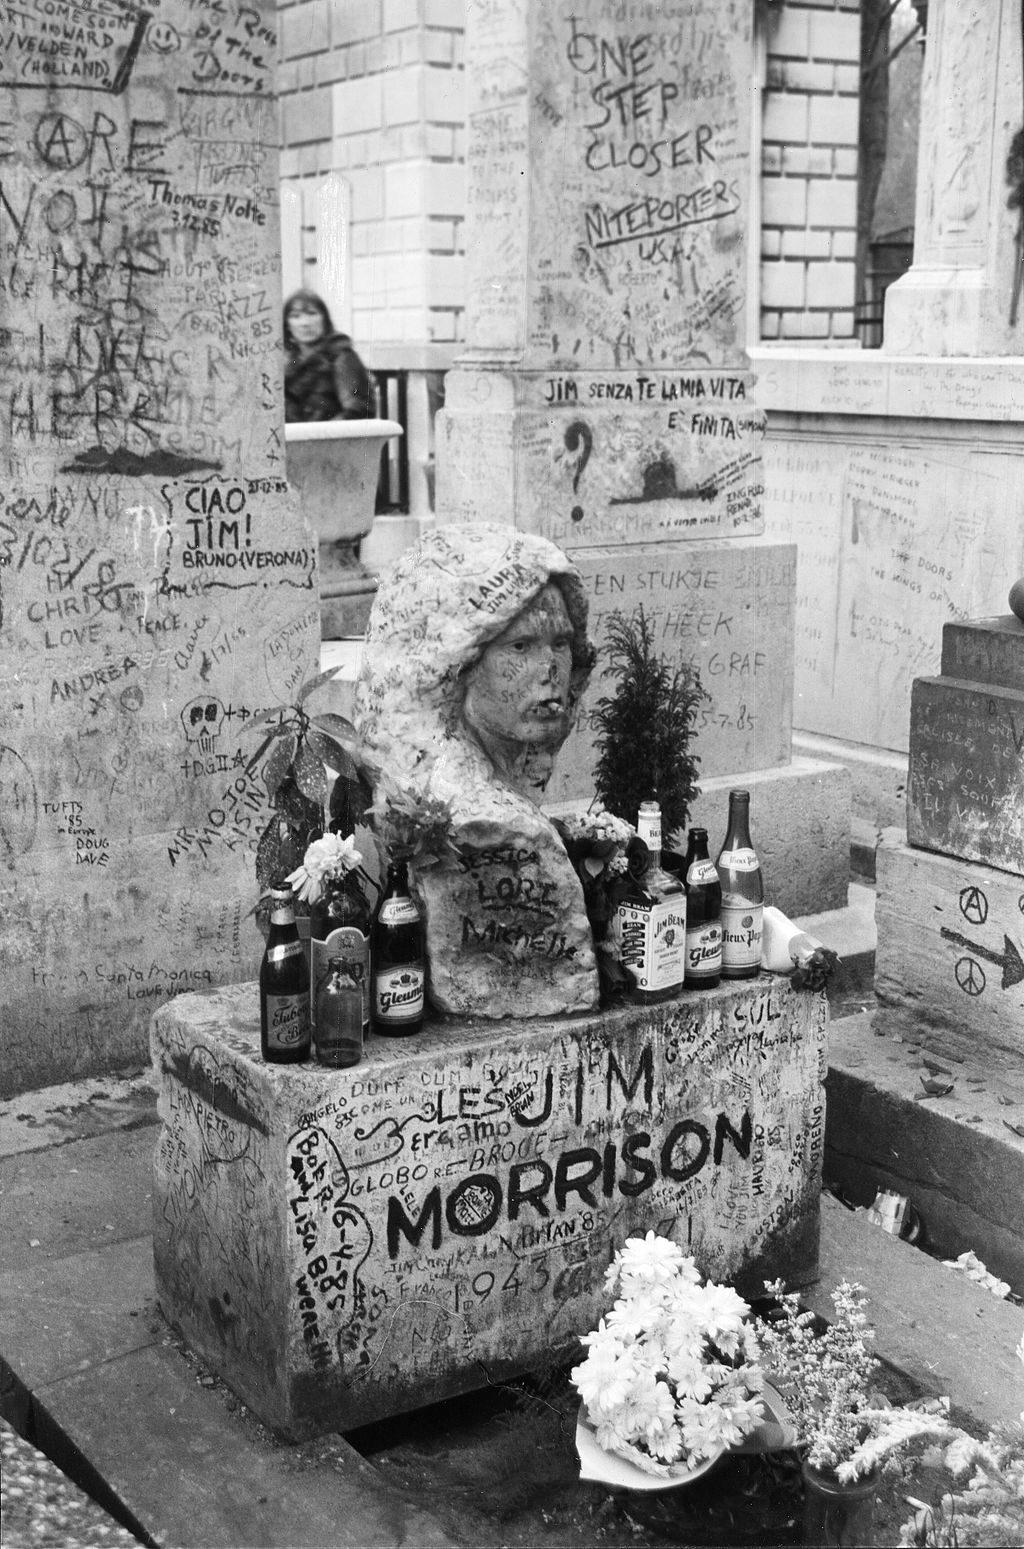 La Tumba De Jim Morrison Y Sus Secretos Rock Legends México